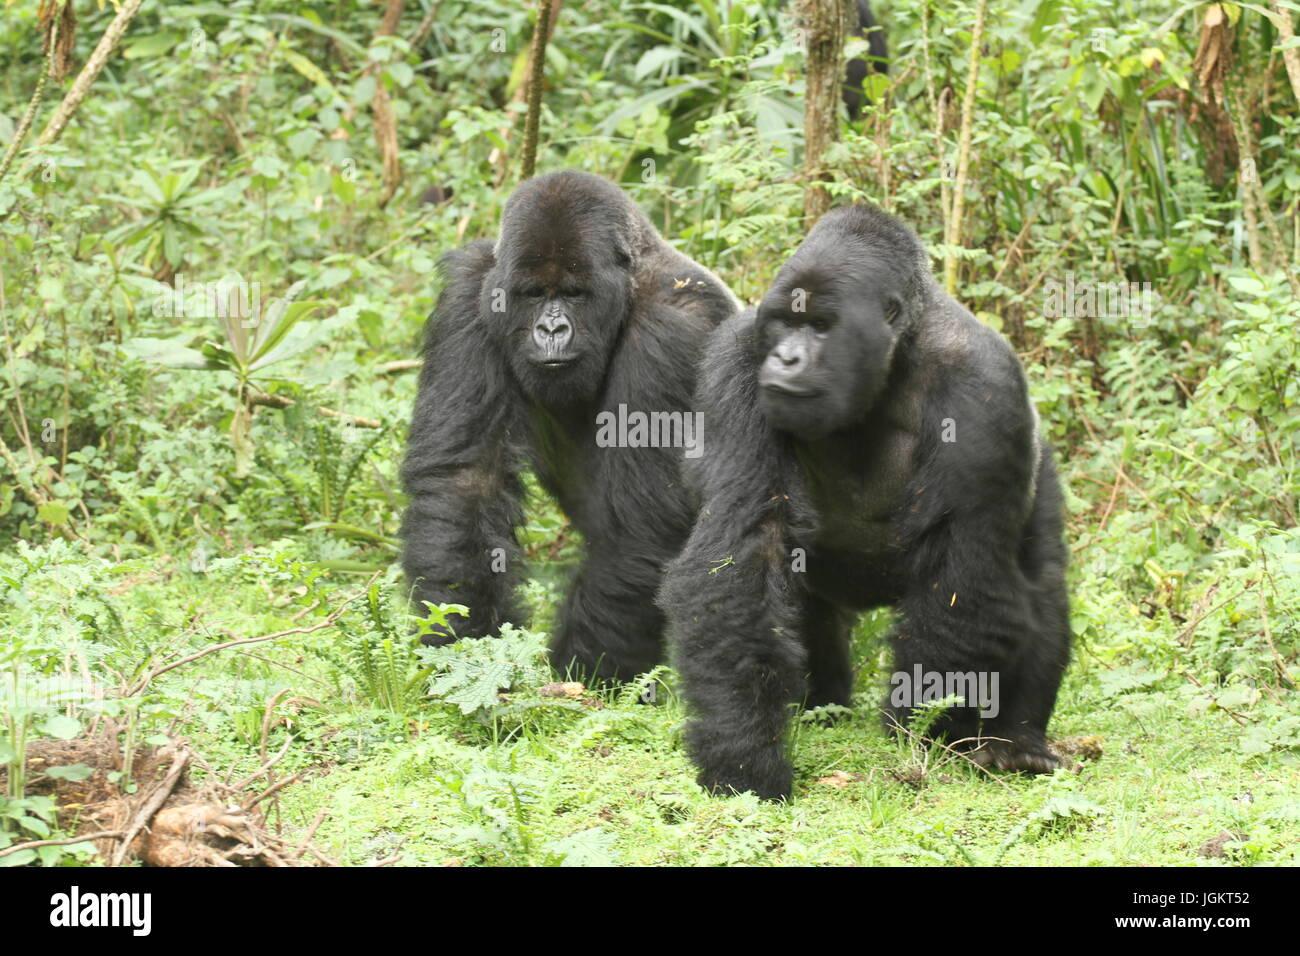 Pair of mountain gorillas. Rwanda - Stock Image